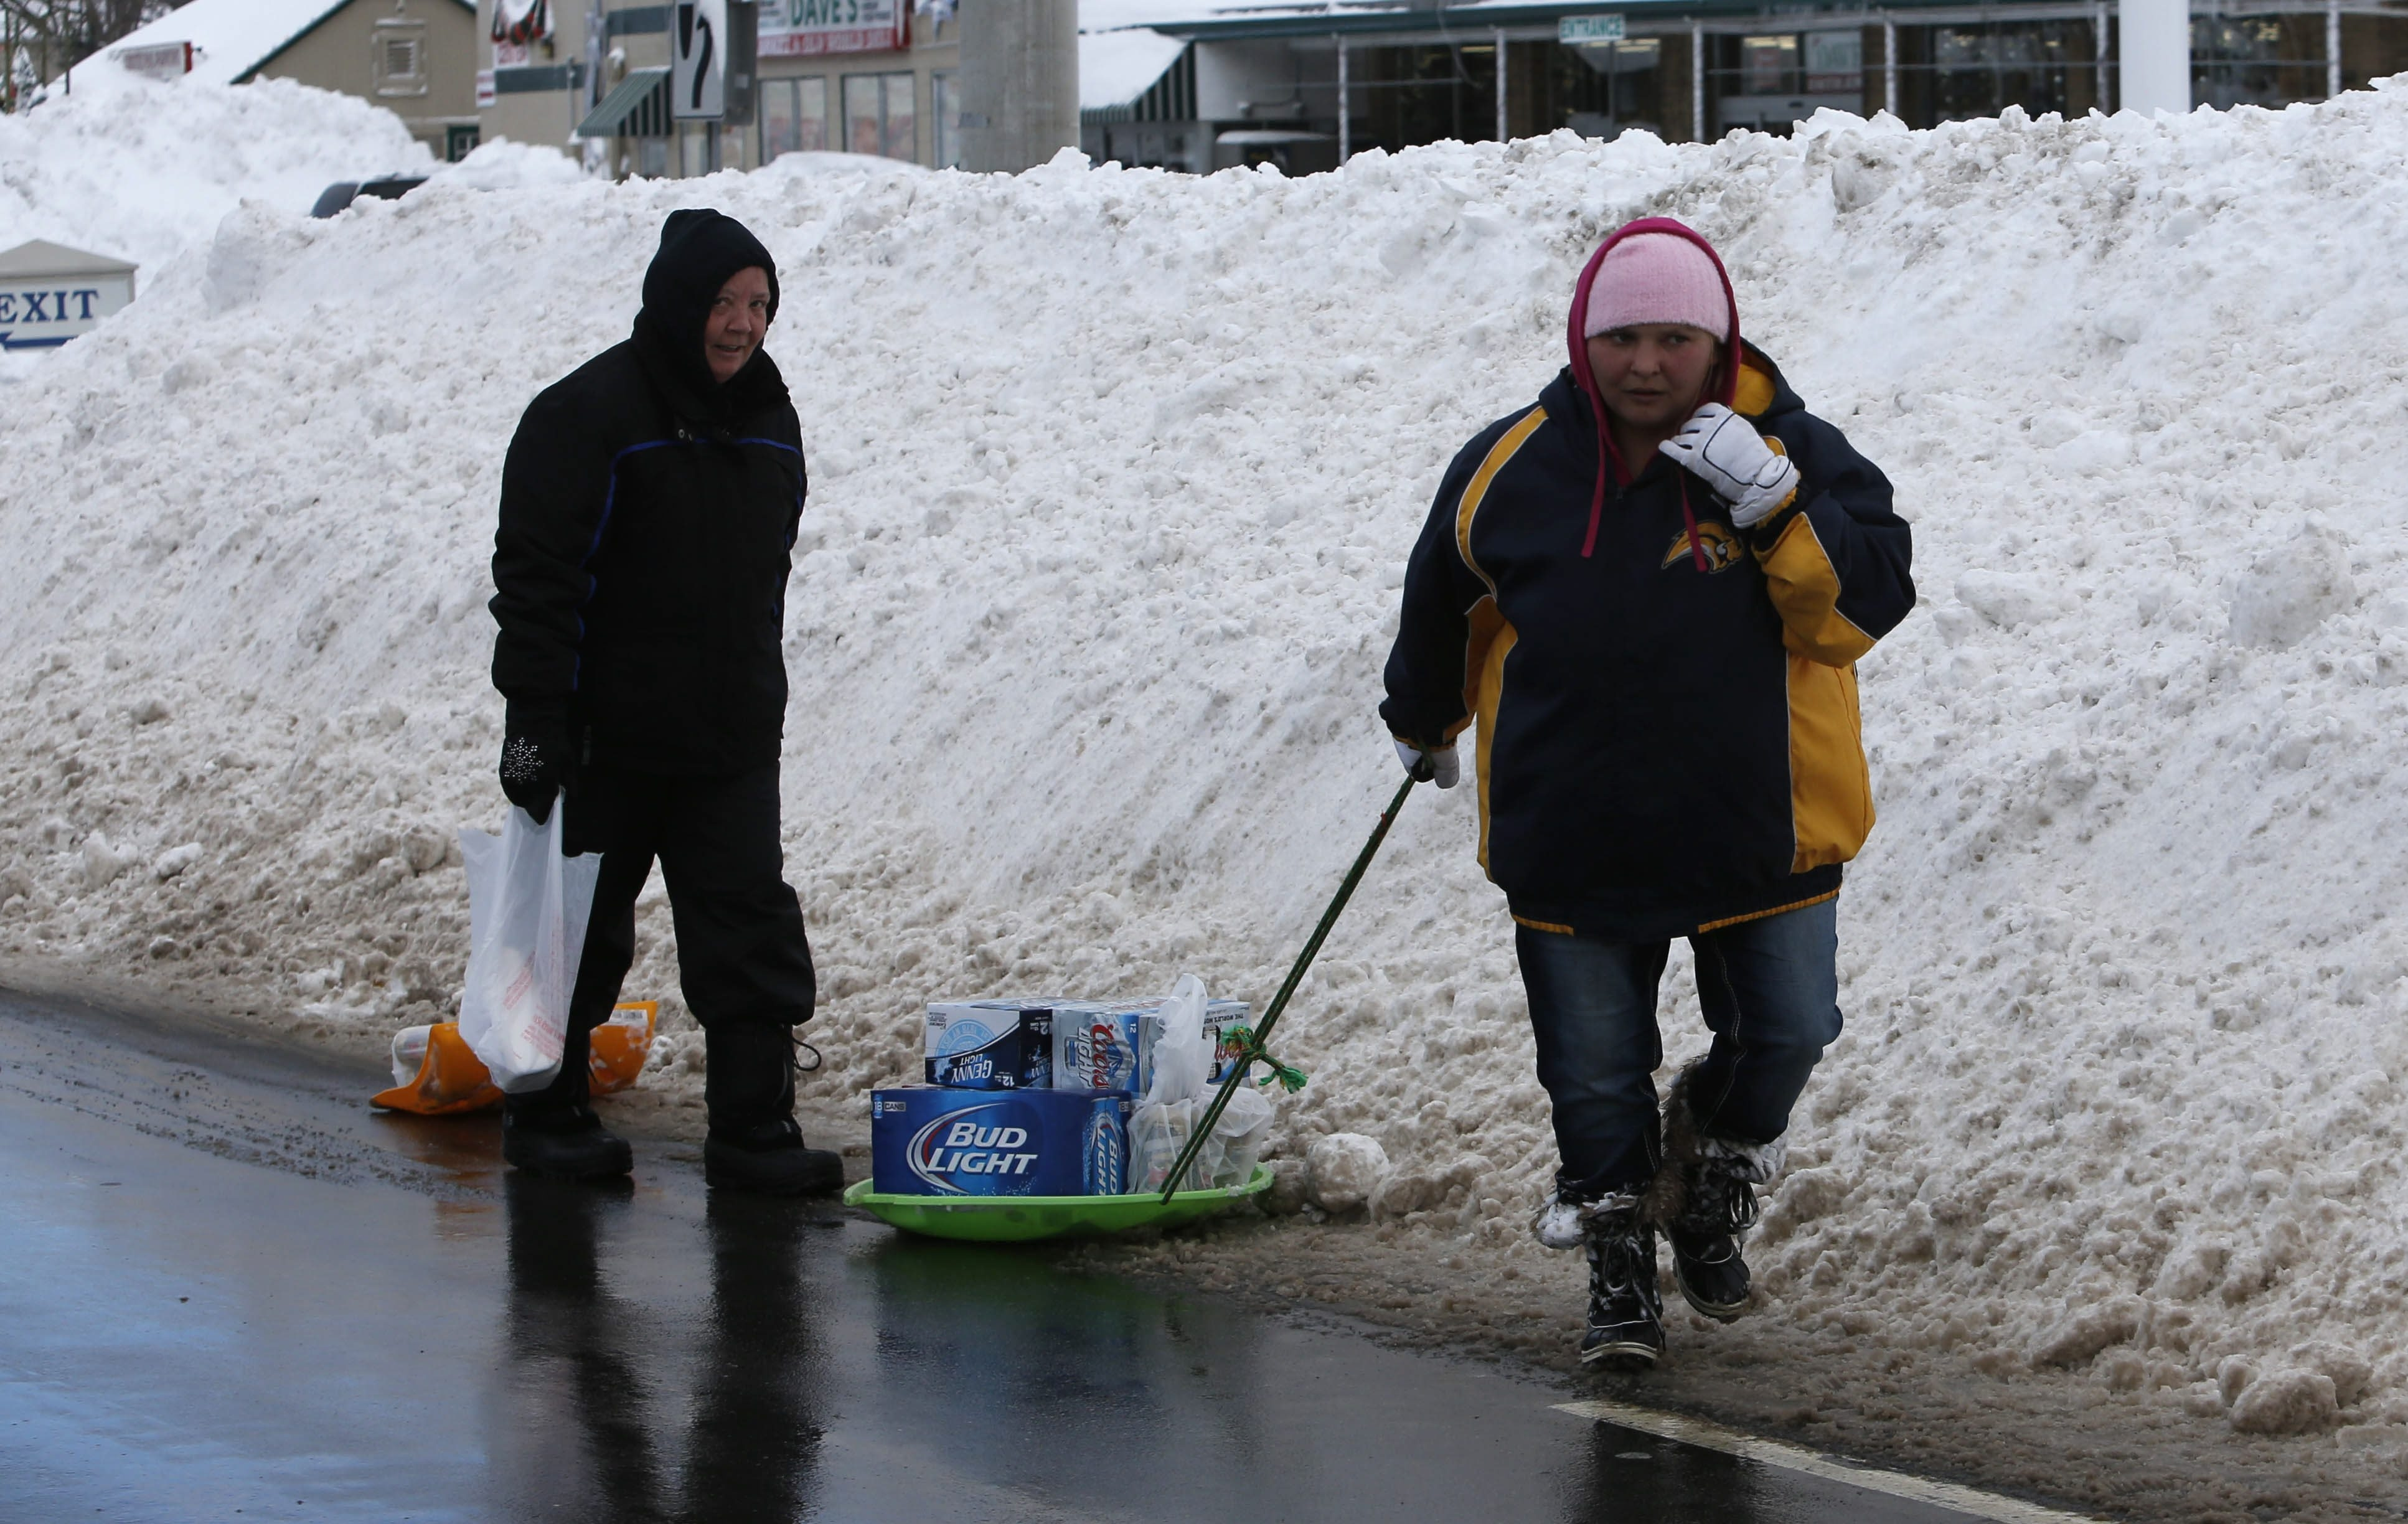 Pedestrians carry supplies down Union Road in Cheektowaga, Thursday, Nov. 20, 2014.  (Derek Gee/Buffalo News)